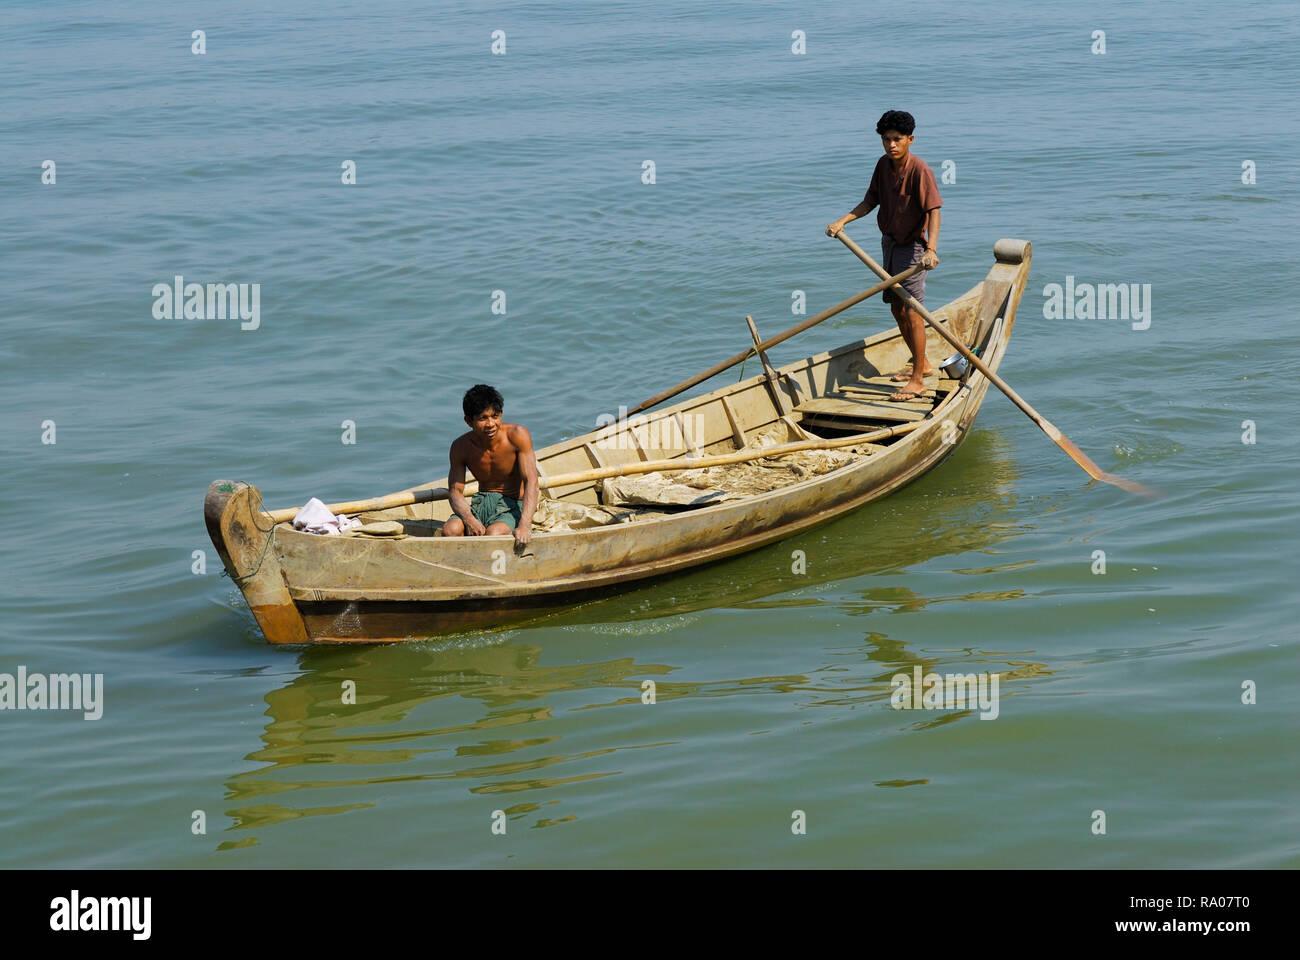 ASIEN, MYANMAR, BURMA, BIRMA, MANDALAY, IRRAWADDY  Fluss, junge Maenner mit einem Ruderboot   |ASIA, MYANMAR, BURMA, BIRMA, MANDALAY, AYEYARWADY RIVER - Stock Image